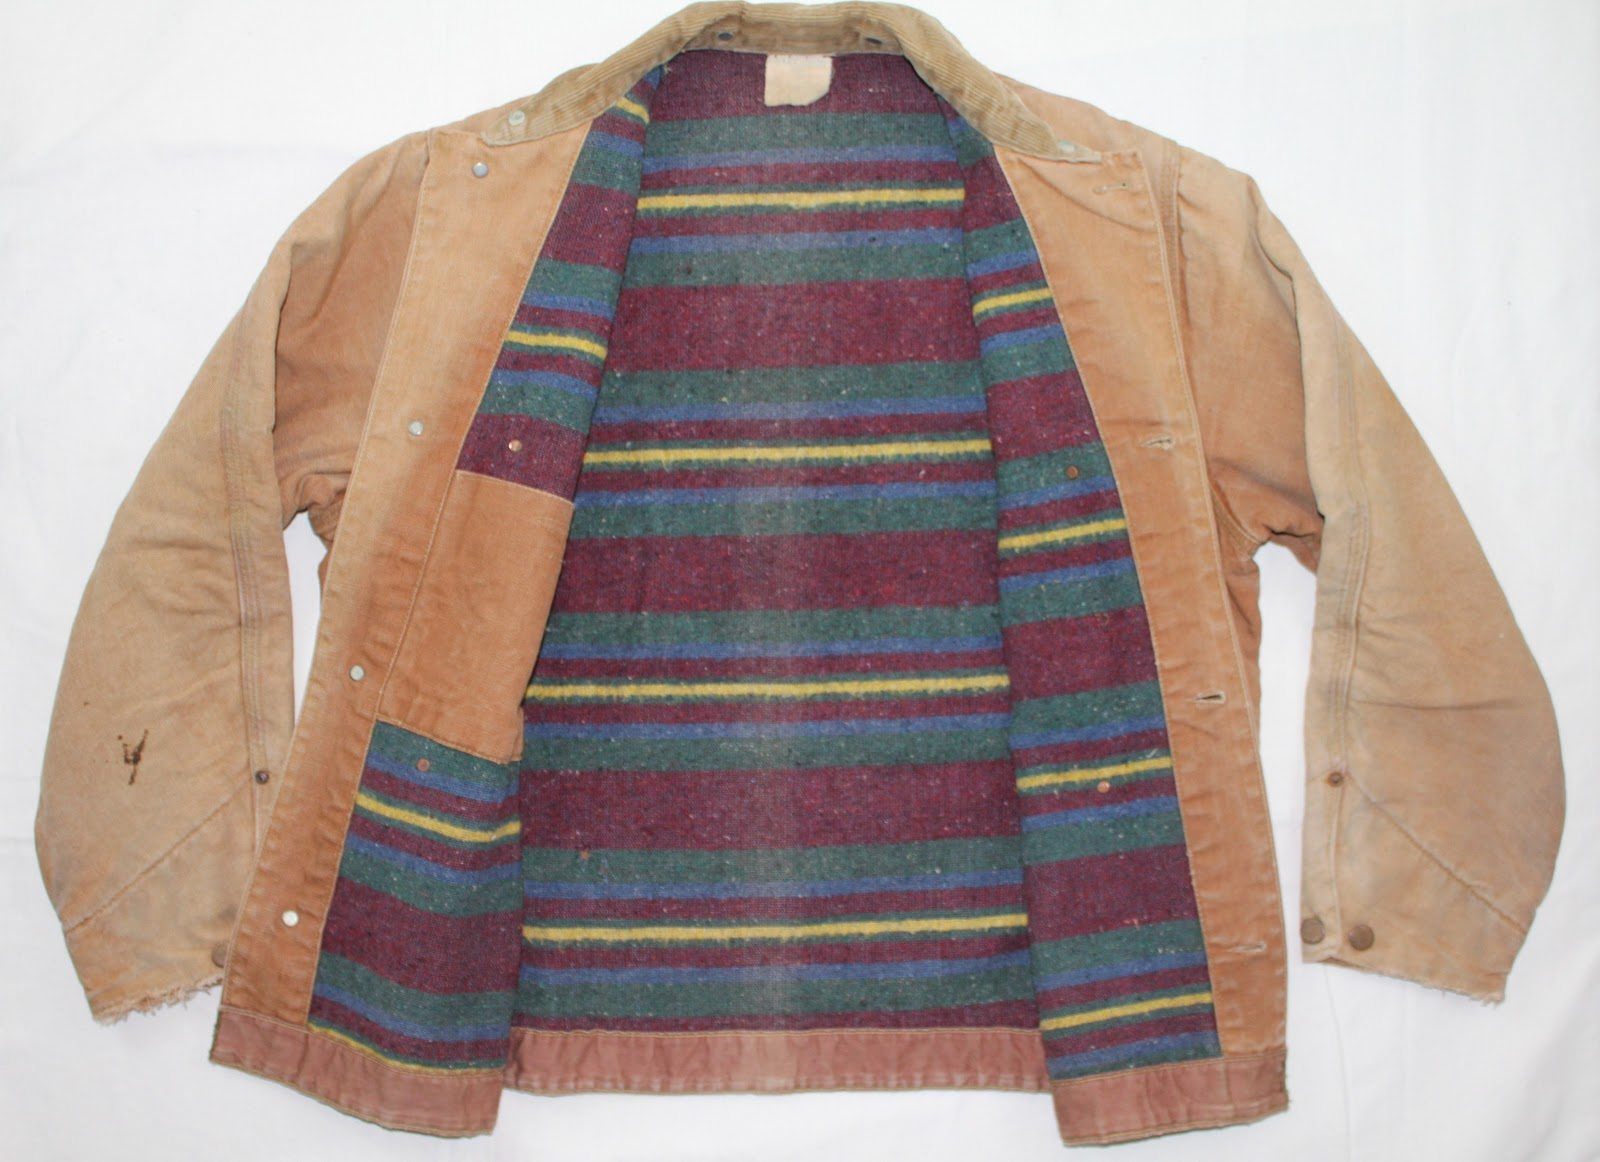 Sears Jackets